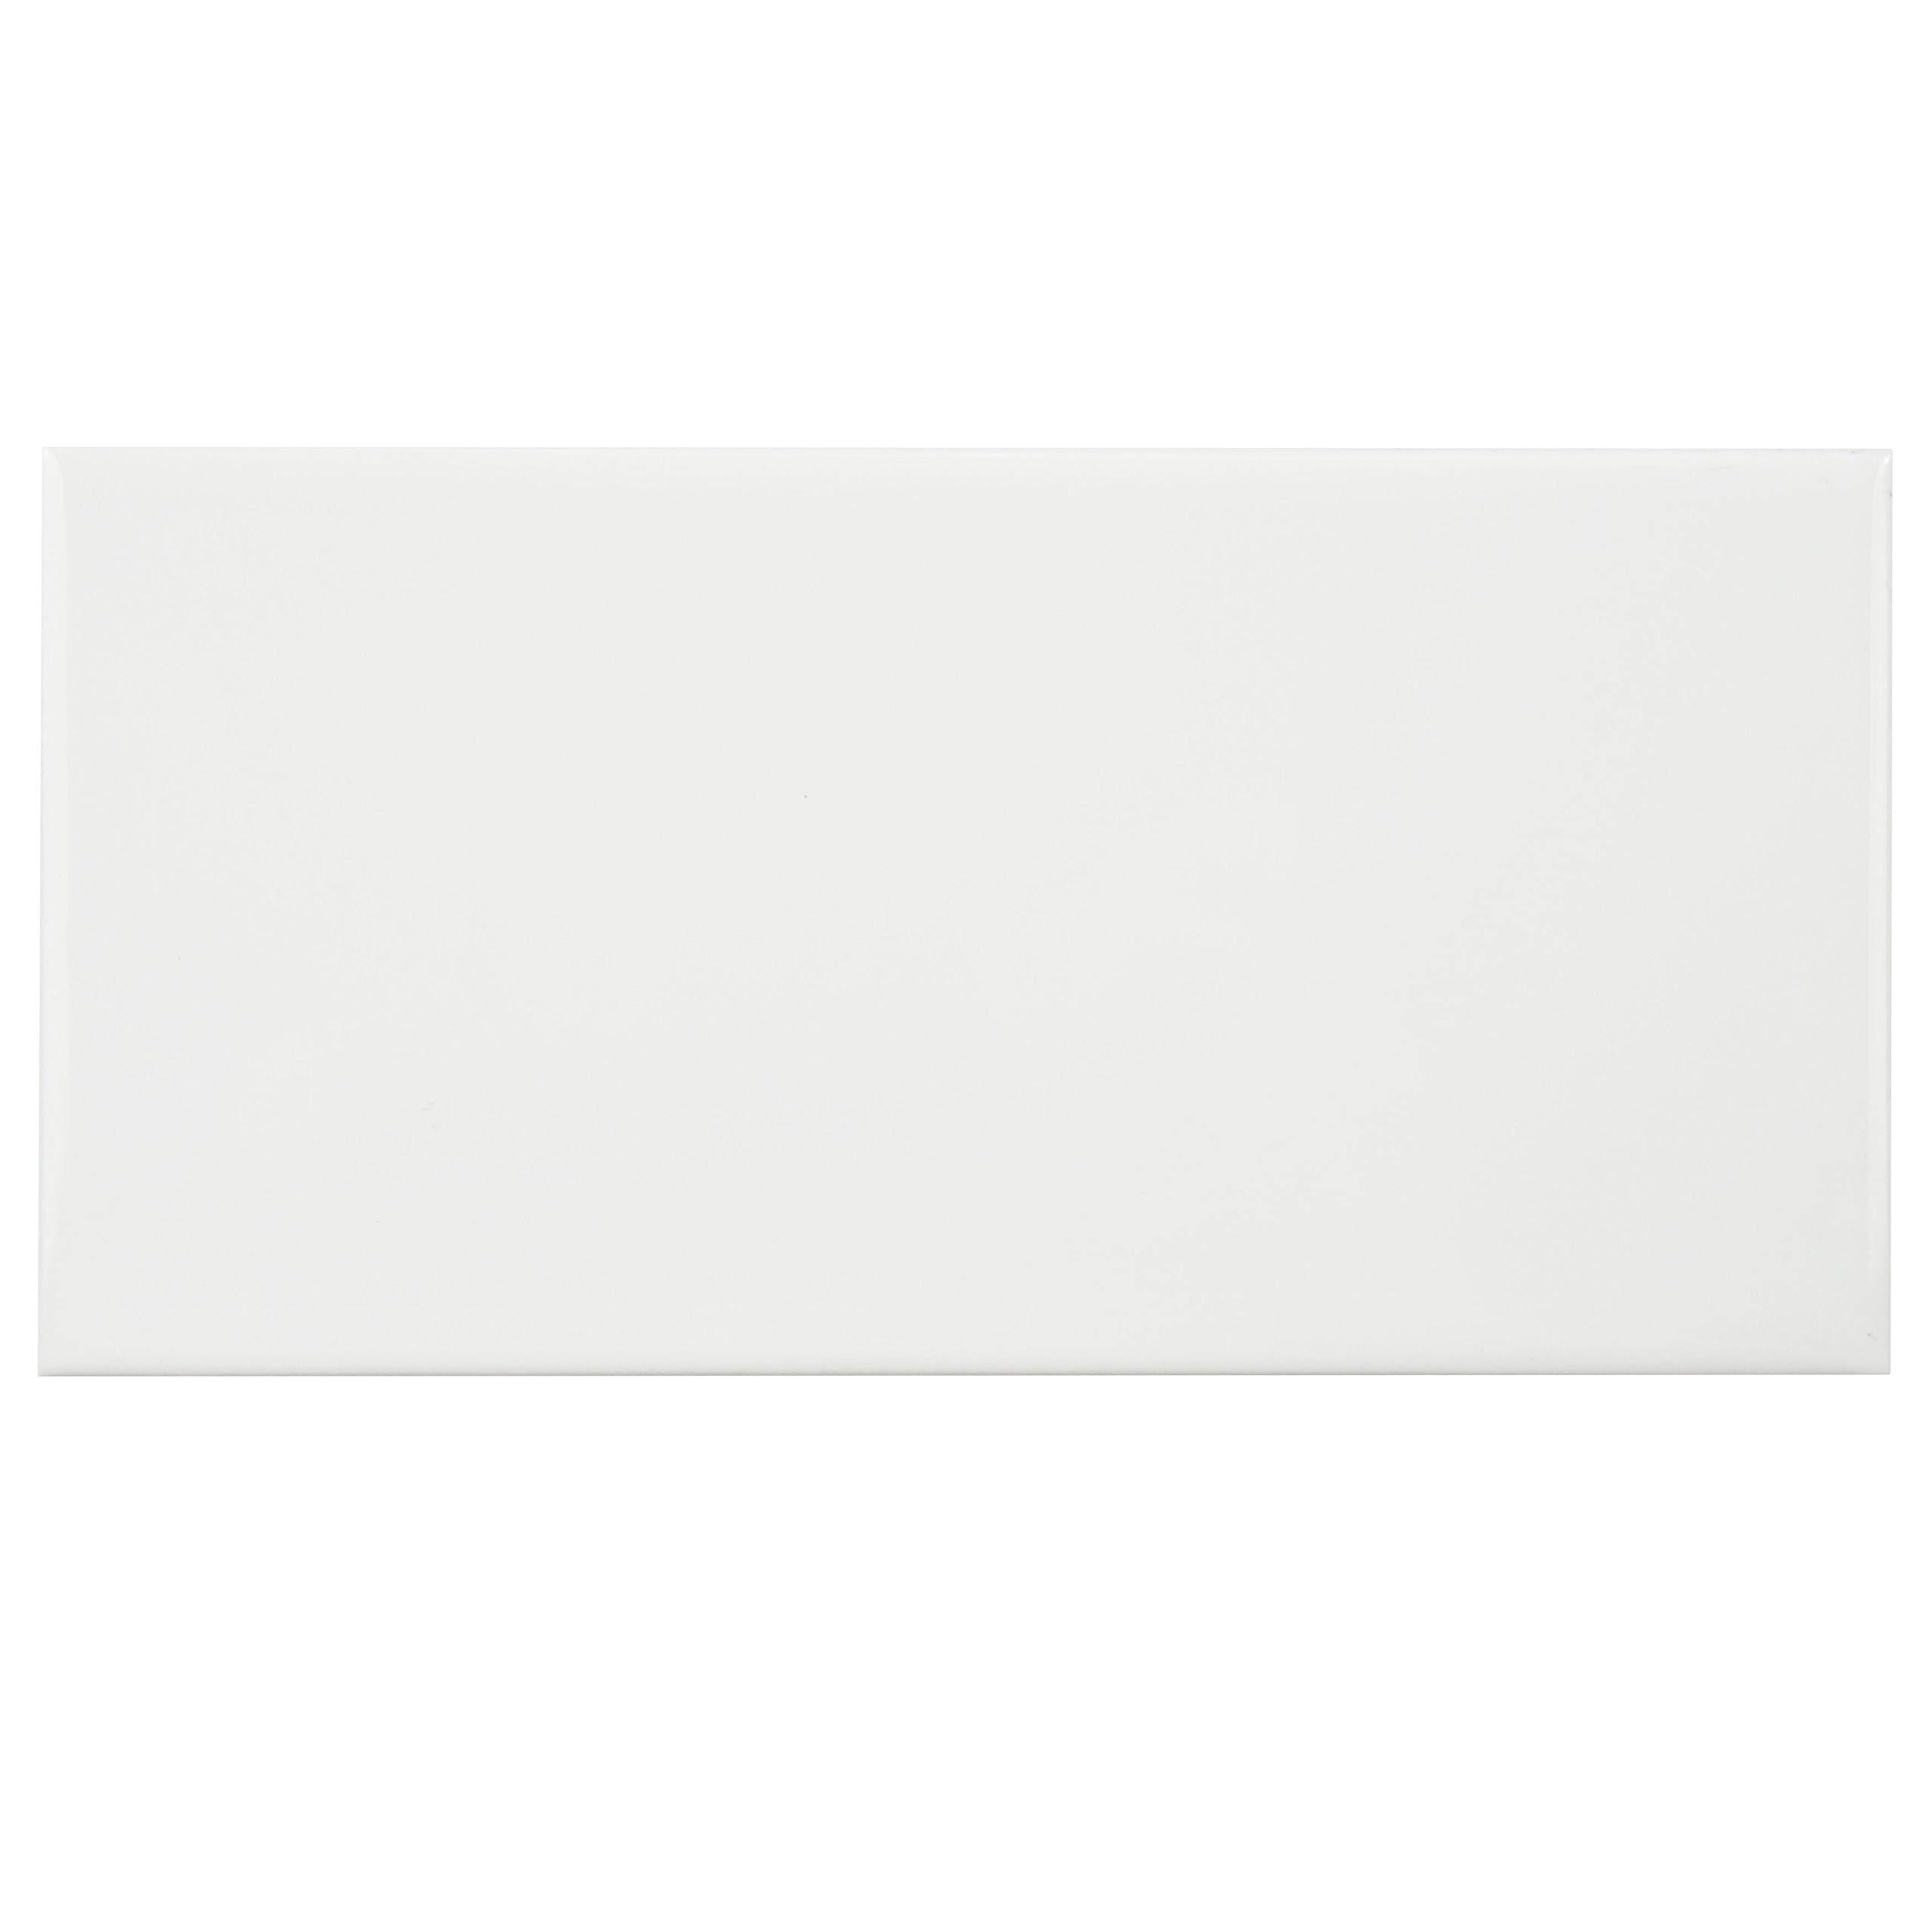 SomerTile WXR3PSGW Pente Subway Ceramic Wall Tile, 3'' x 6'', Glossy White by SOMERTILE